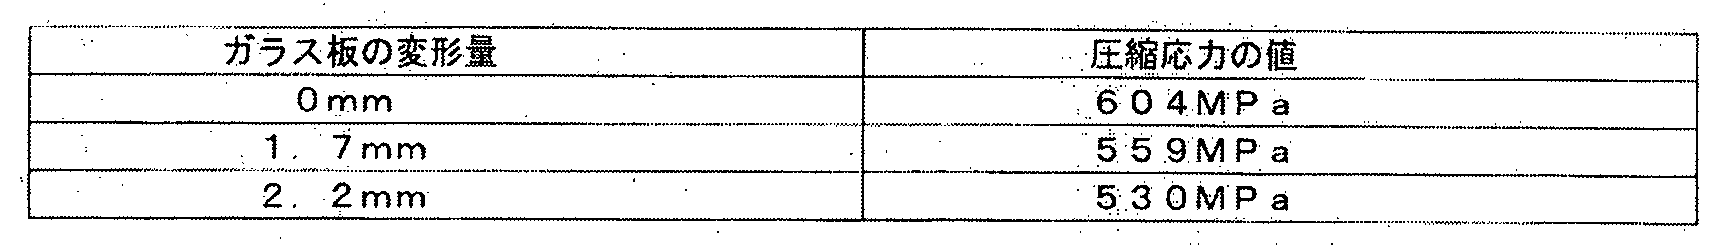 Figure WO-DOC-TABLE-2